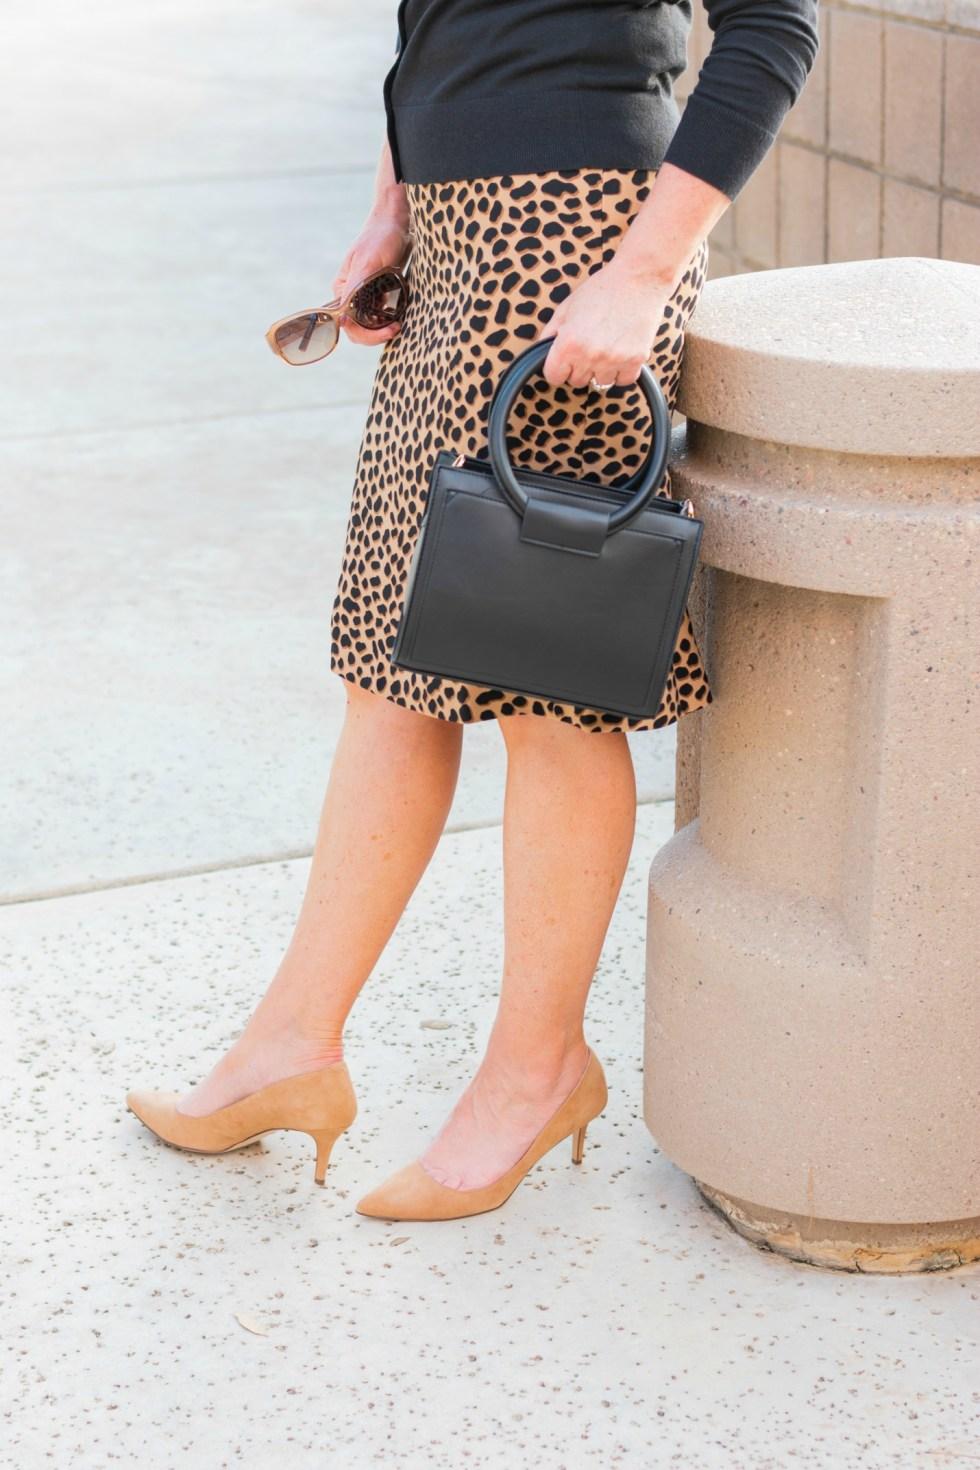 Cheetah Print Skirt and Cardigan